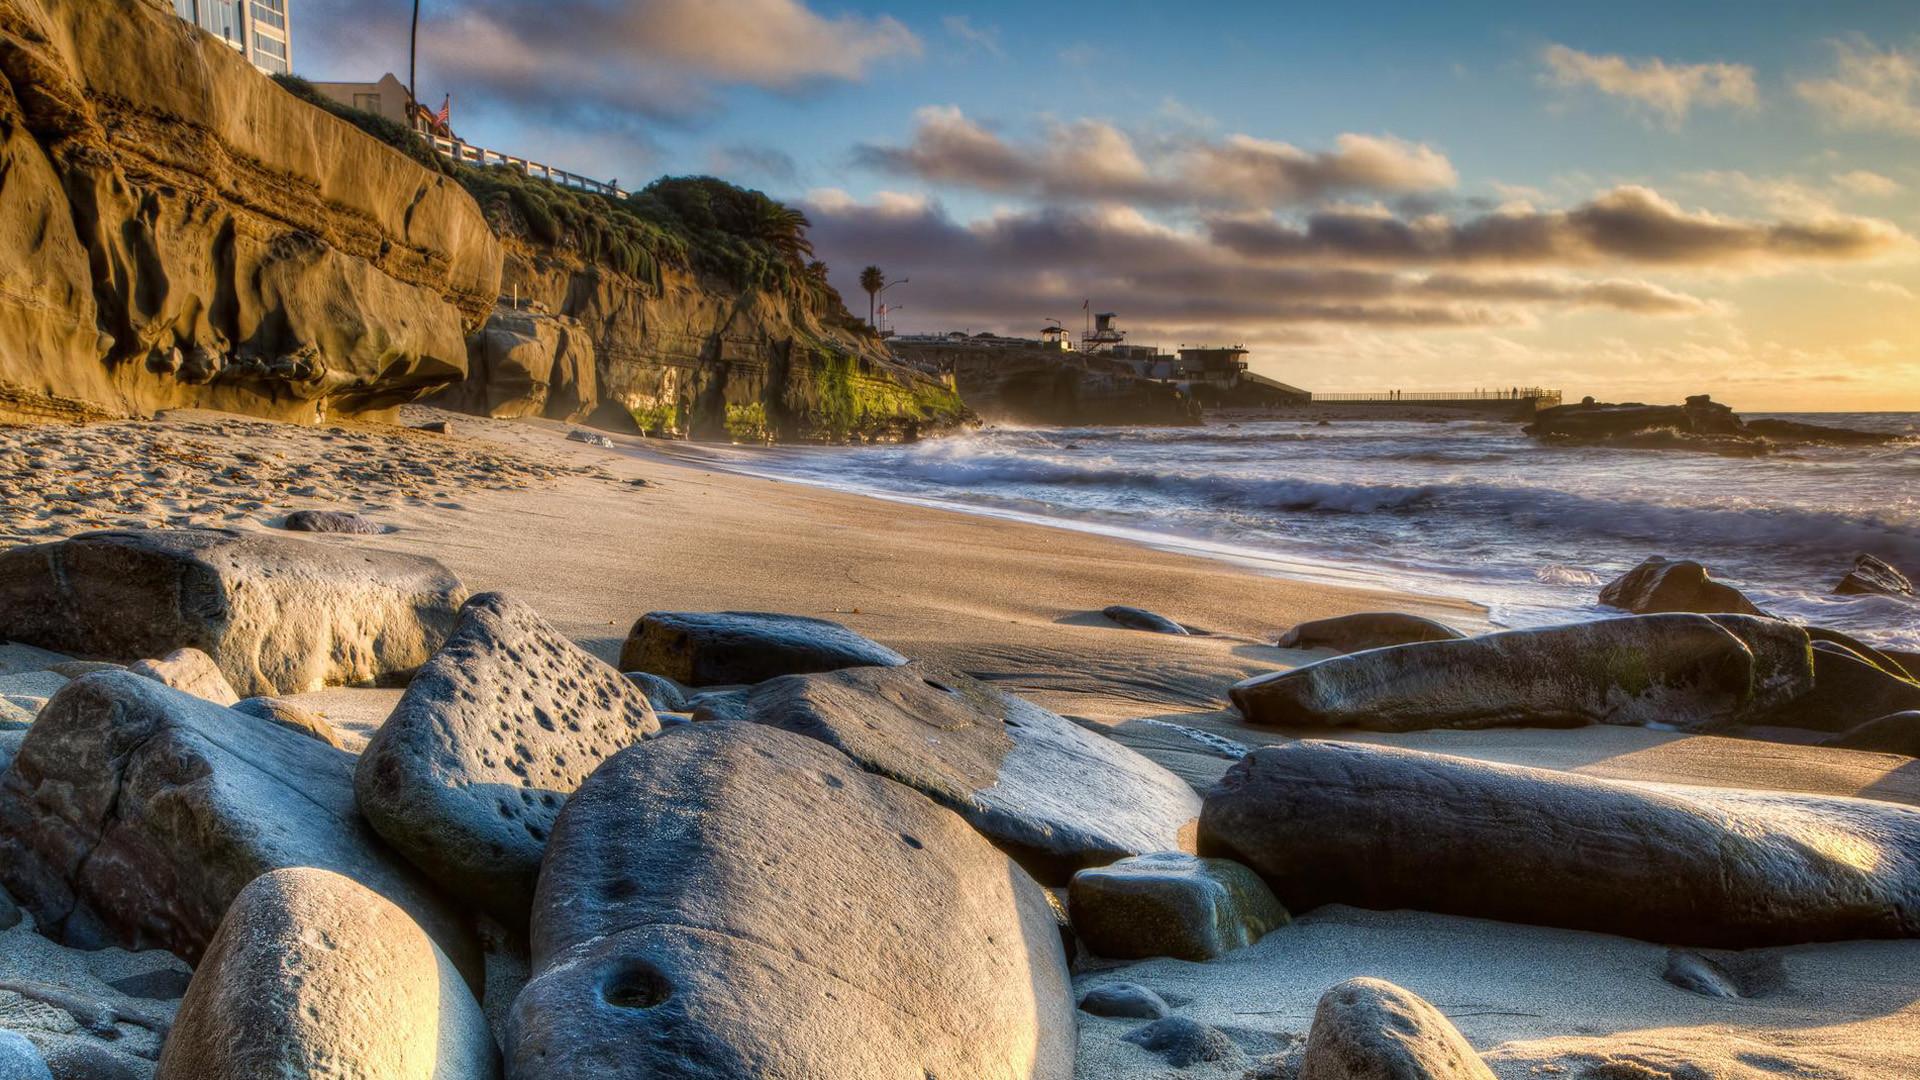 San Diego Beach Desktop Wallpaper 14116